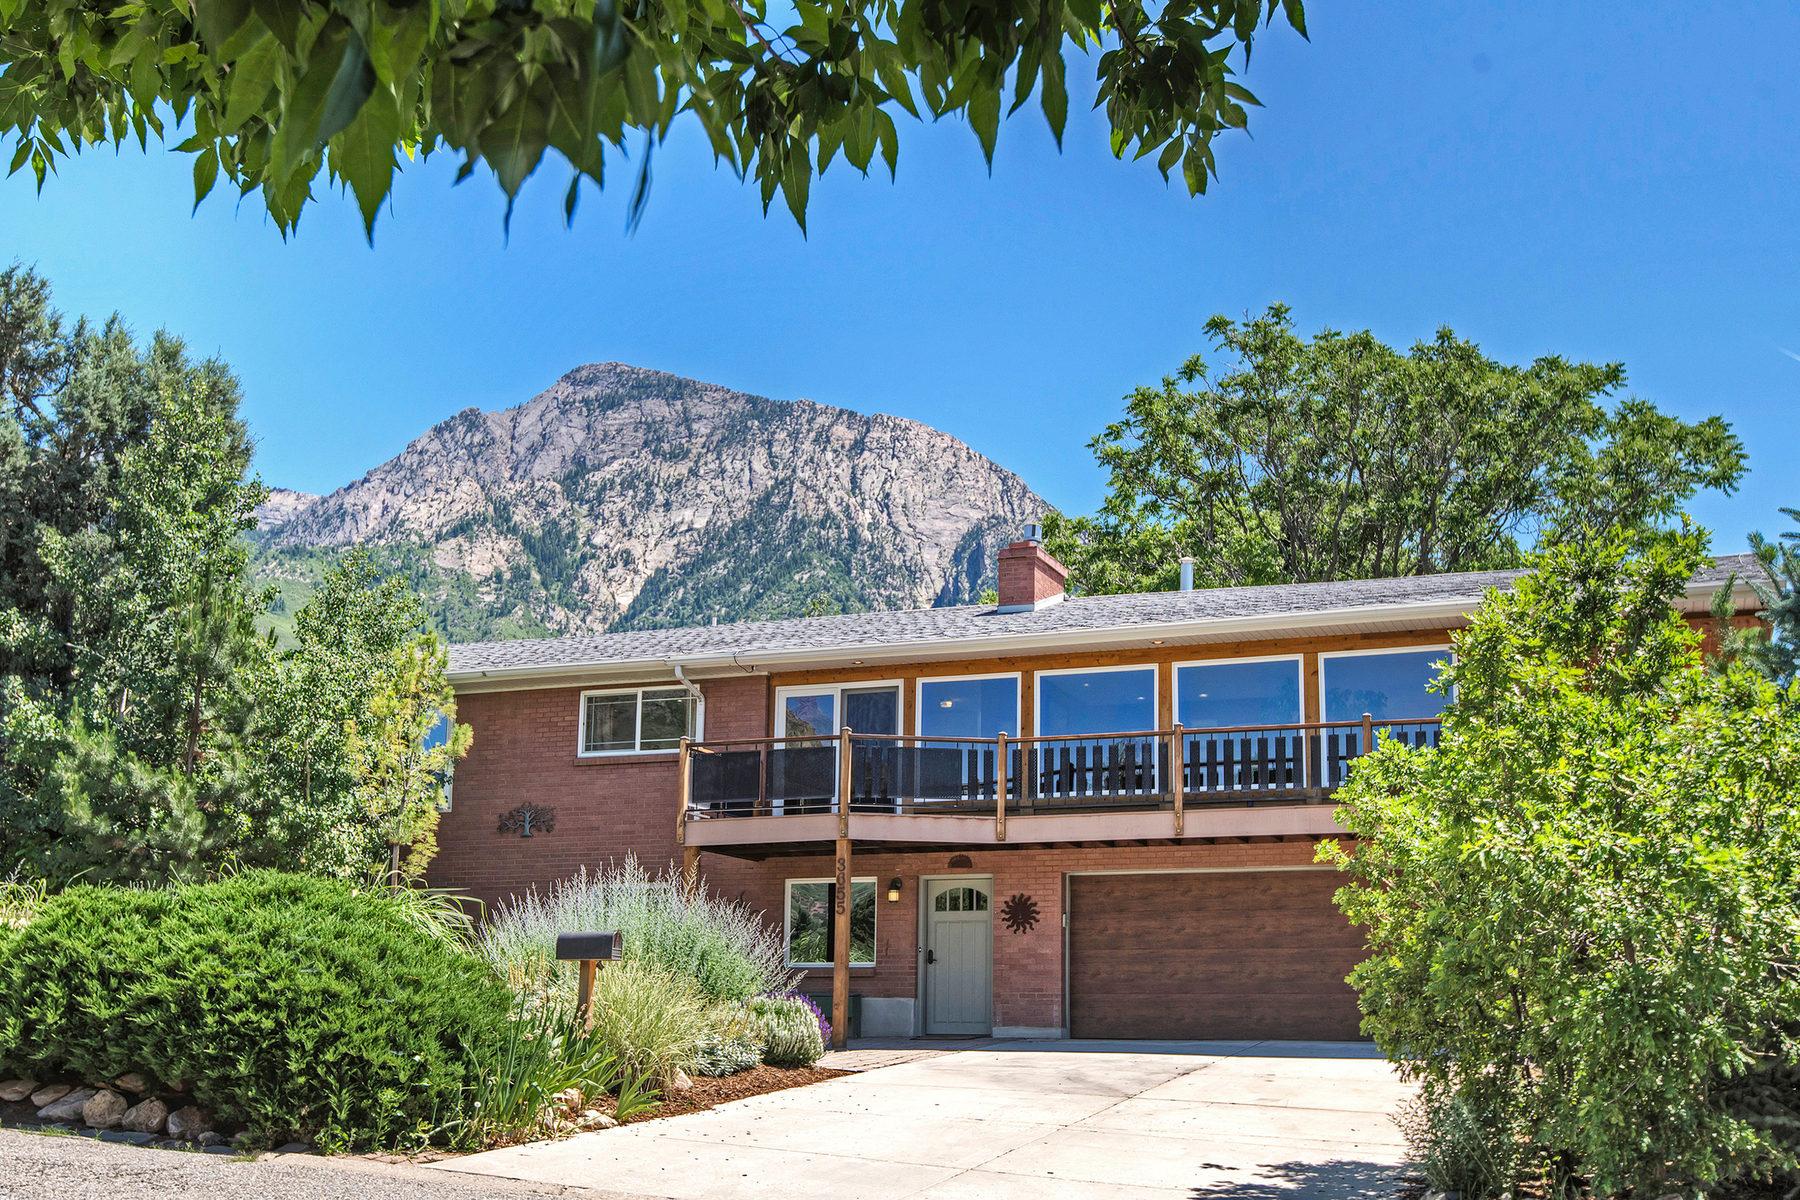 Villa per Vendita alle ore City Views and Mountain Air 3655 E Aurora Cir Salt Lake City, Utah 84124 Stati Uniti